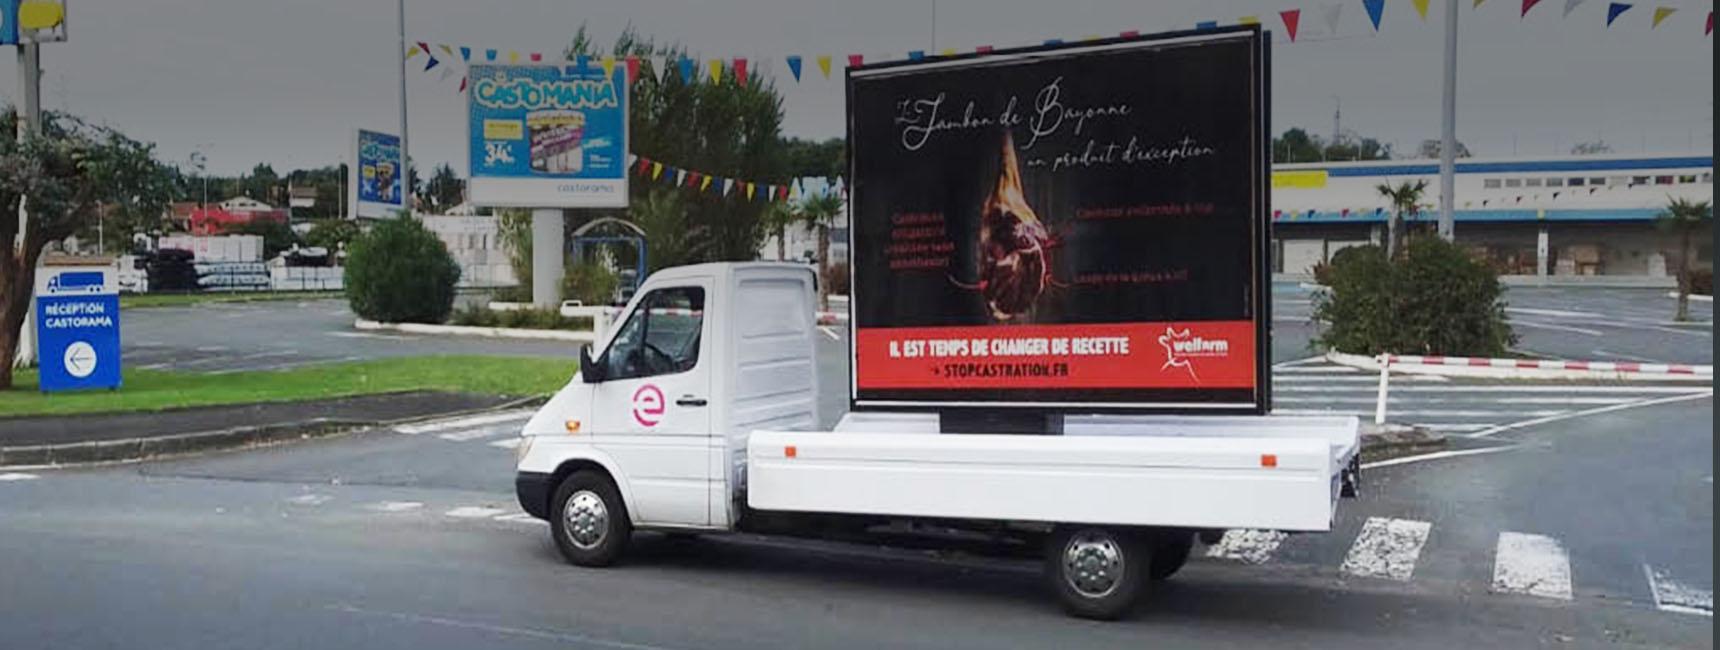 welfarm affichage mobile keemia bordeaux agence marketing local en région aquitaine